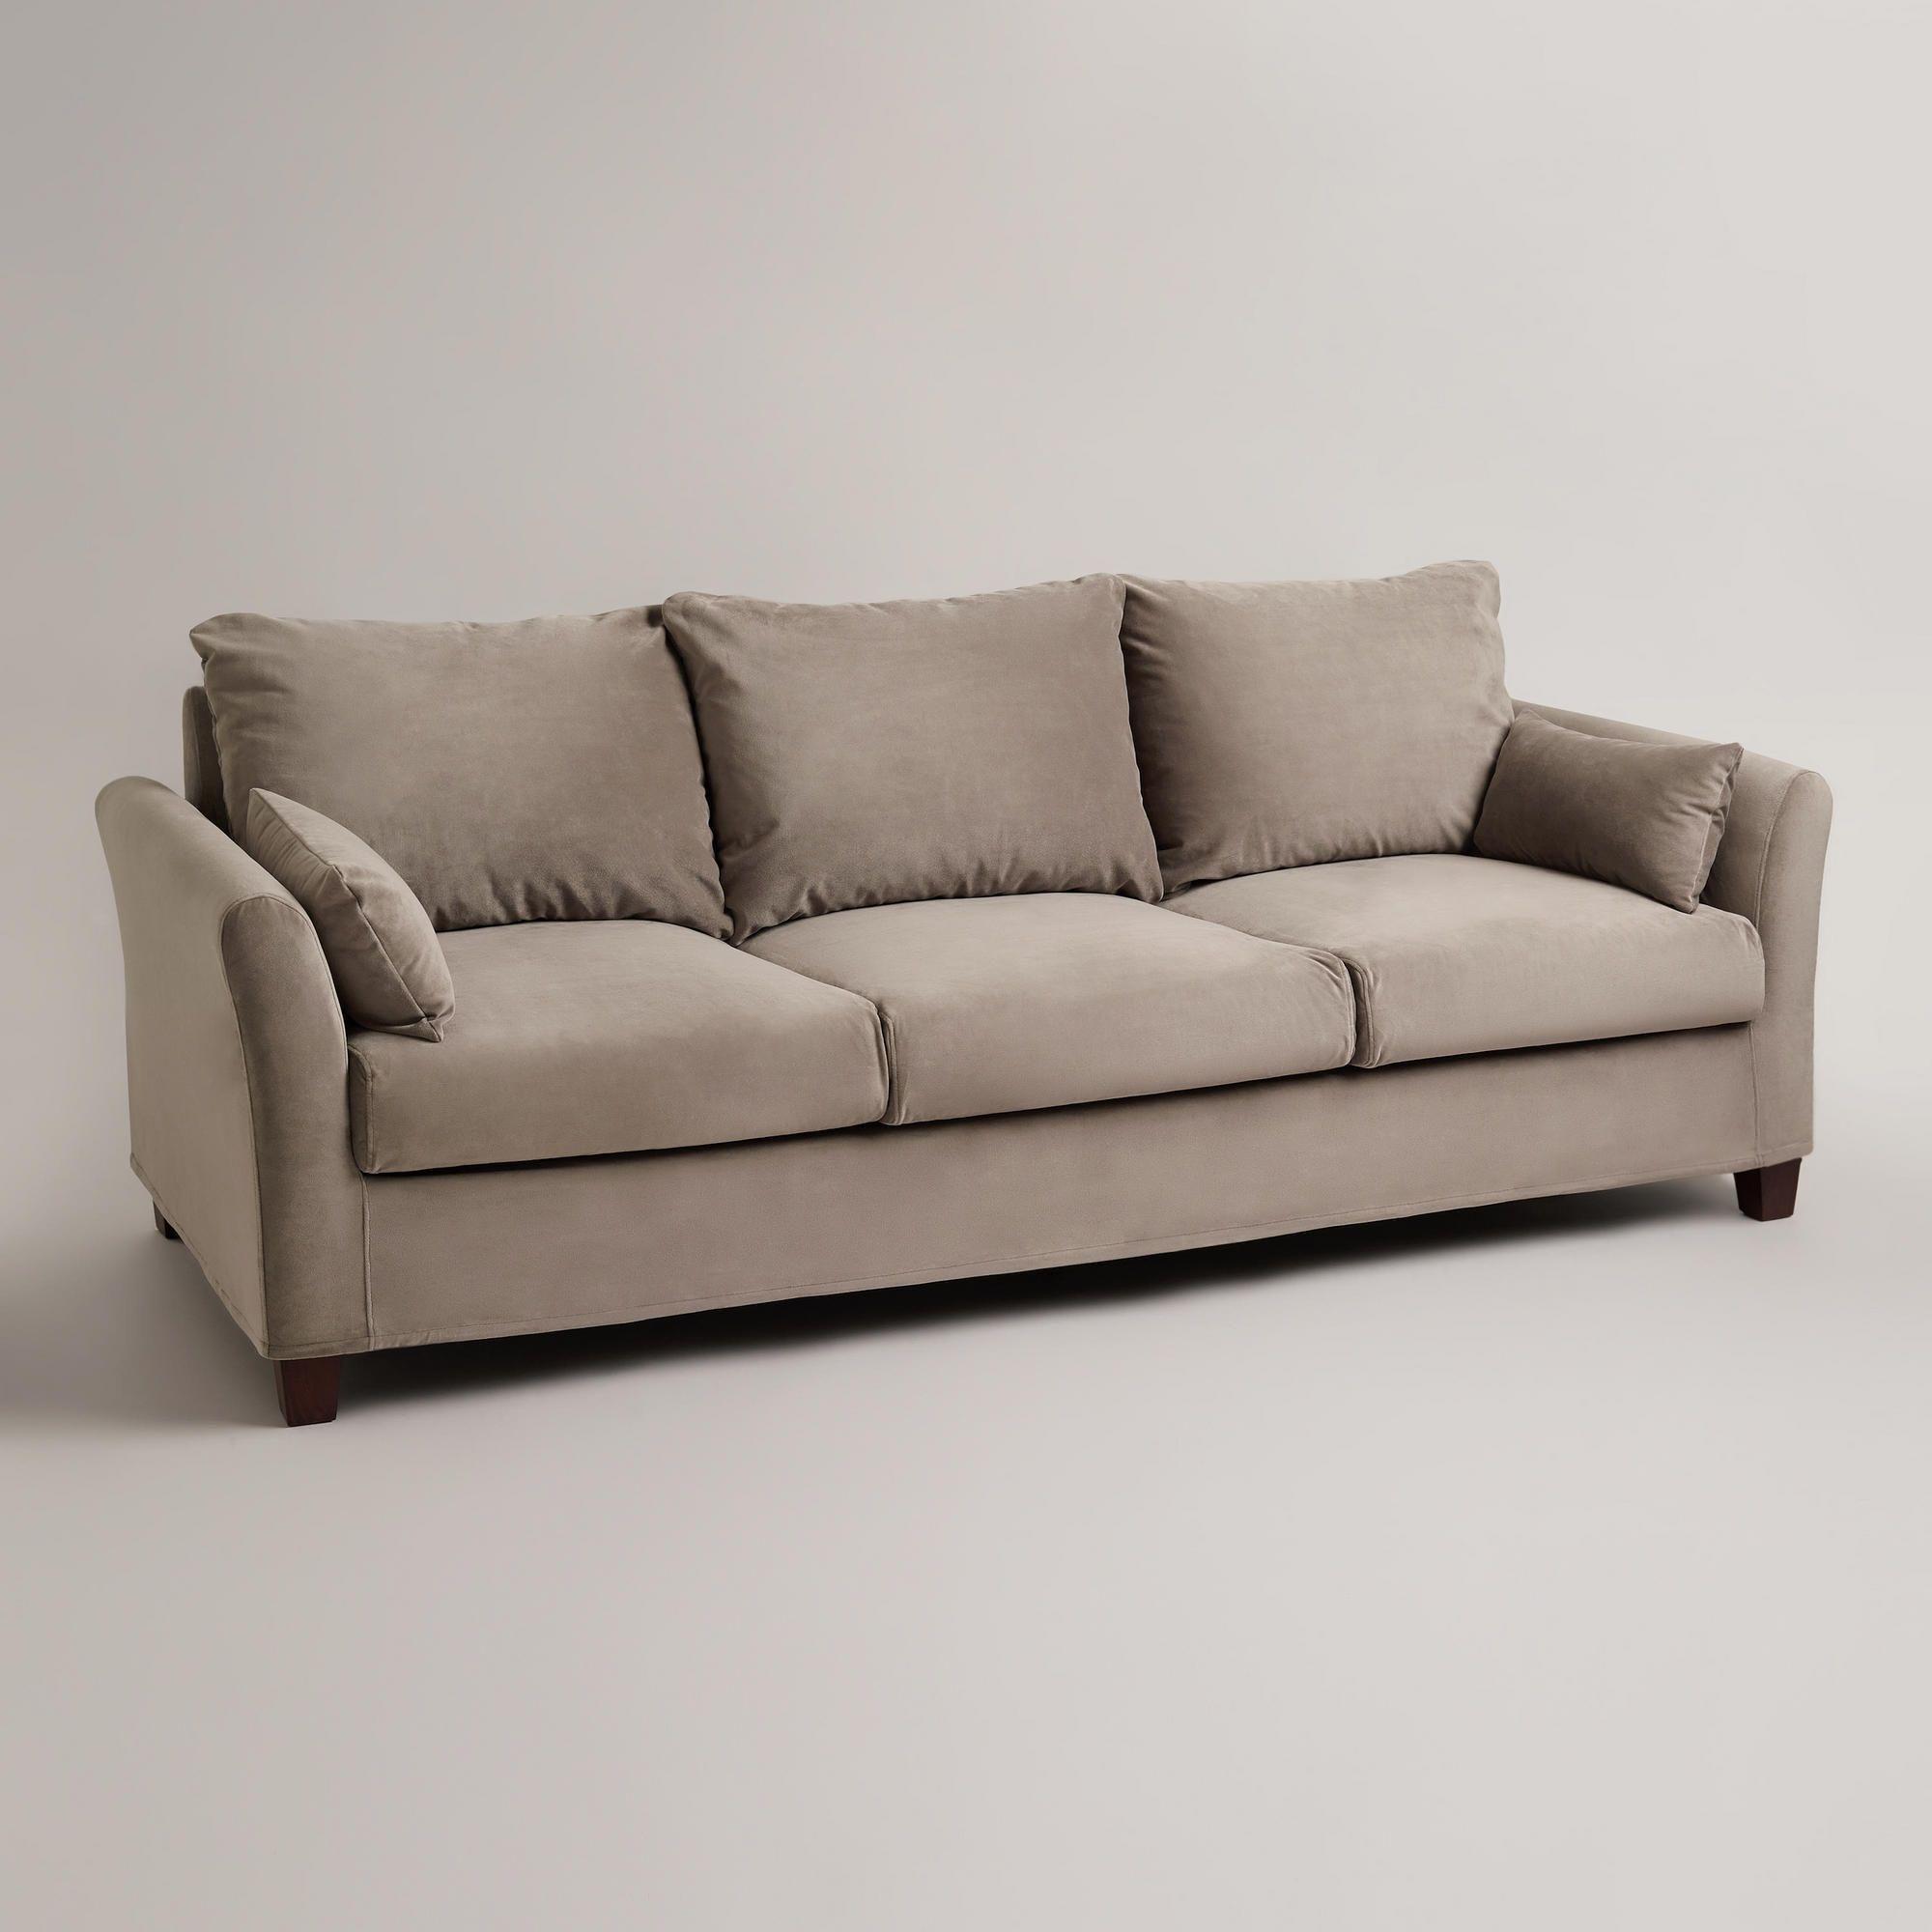 backamo 3 seater sofa slipcover limpeza de em santa barbara d oeste three seat pine point slipcovered